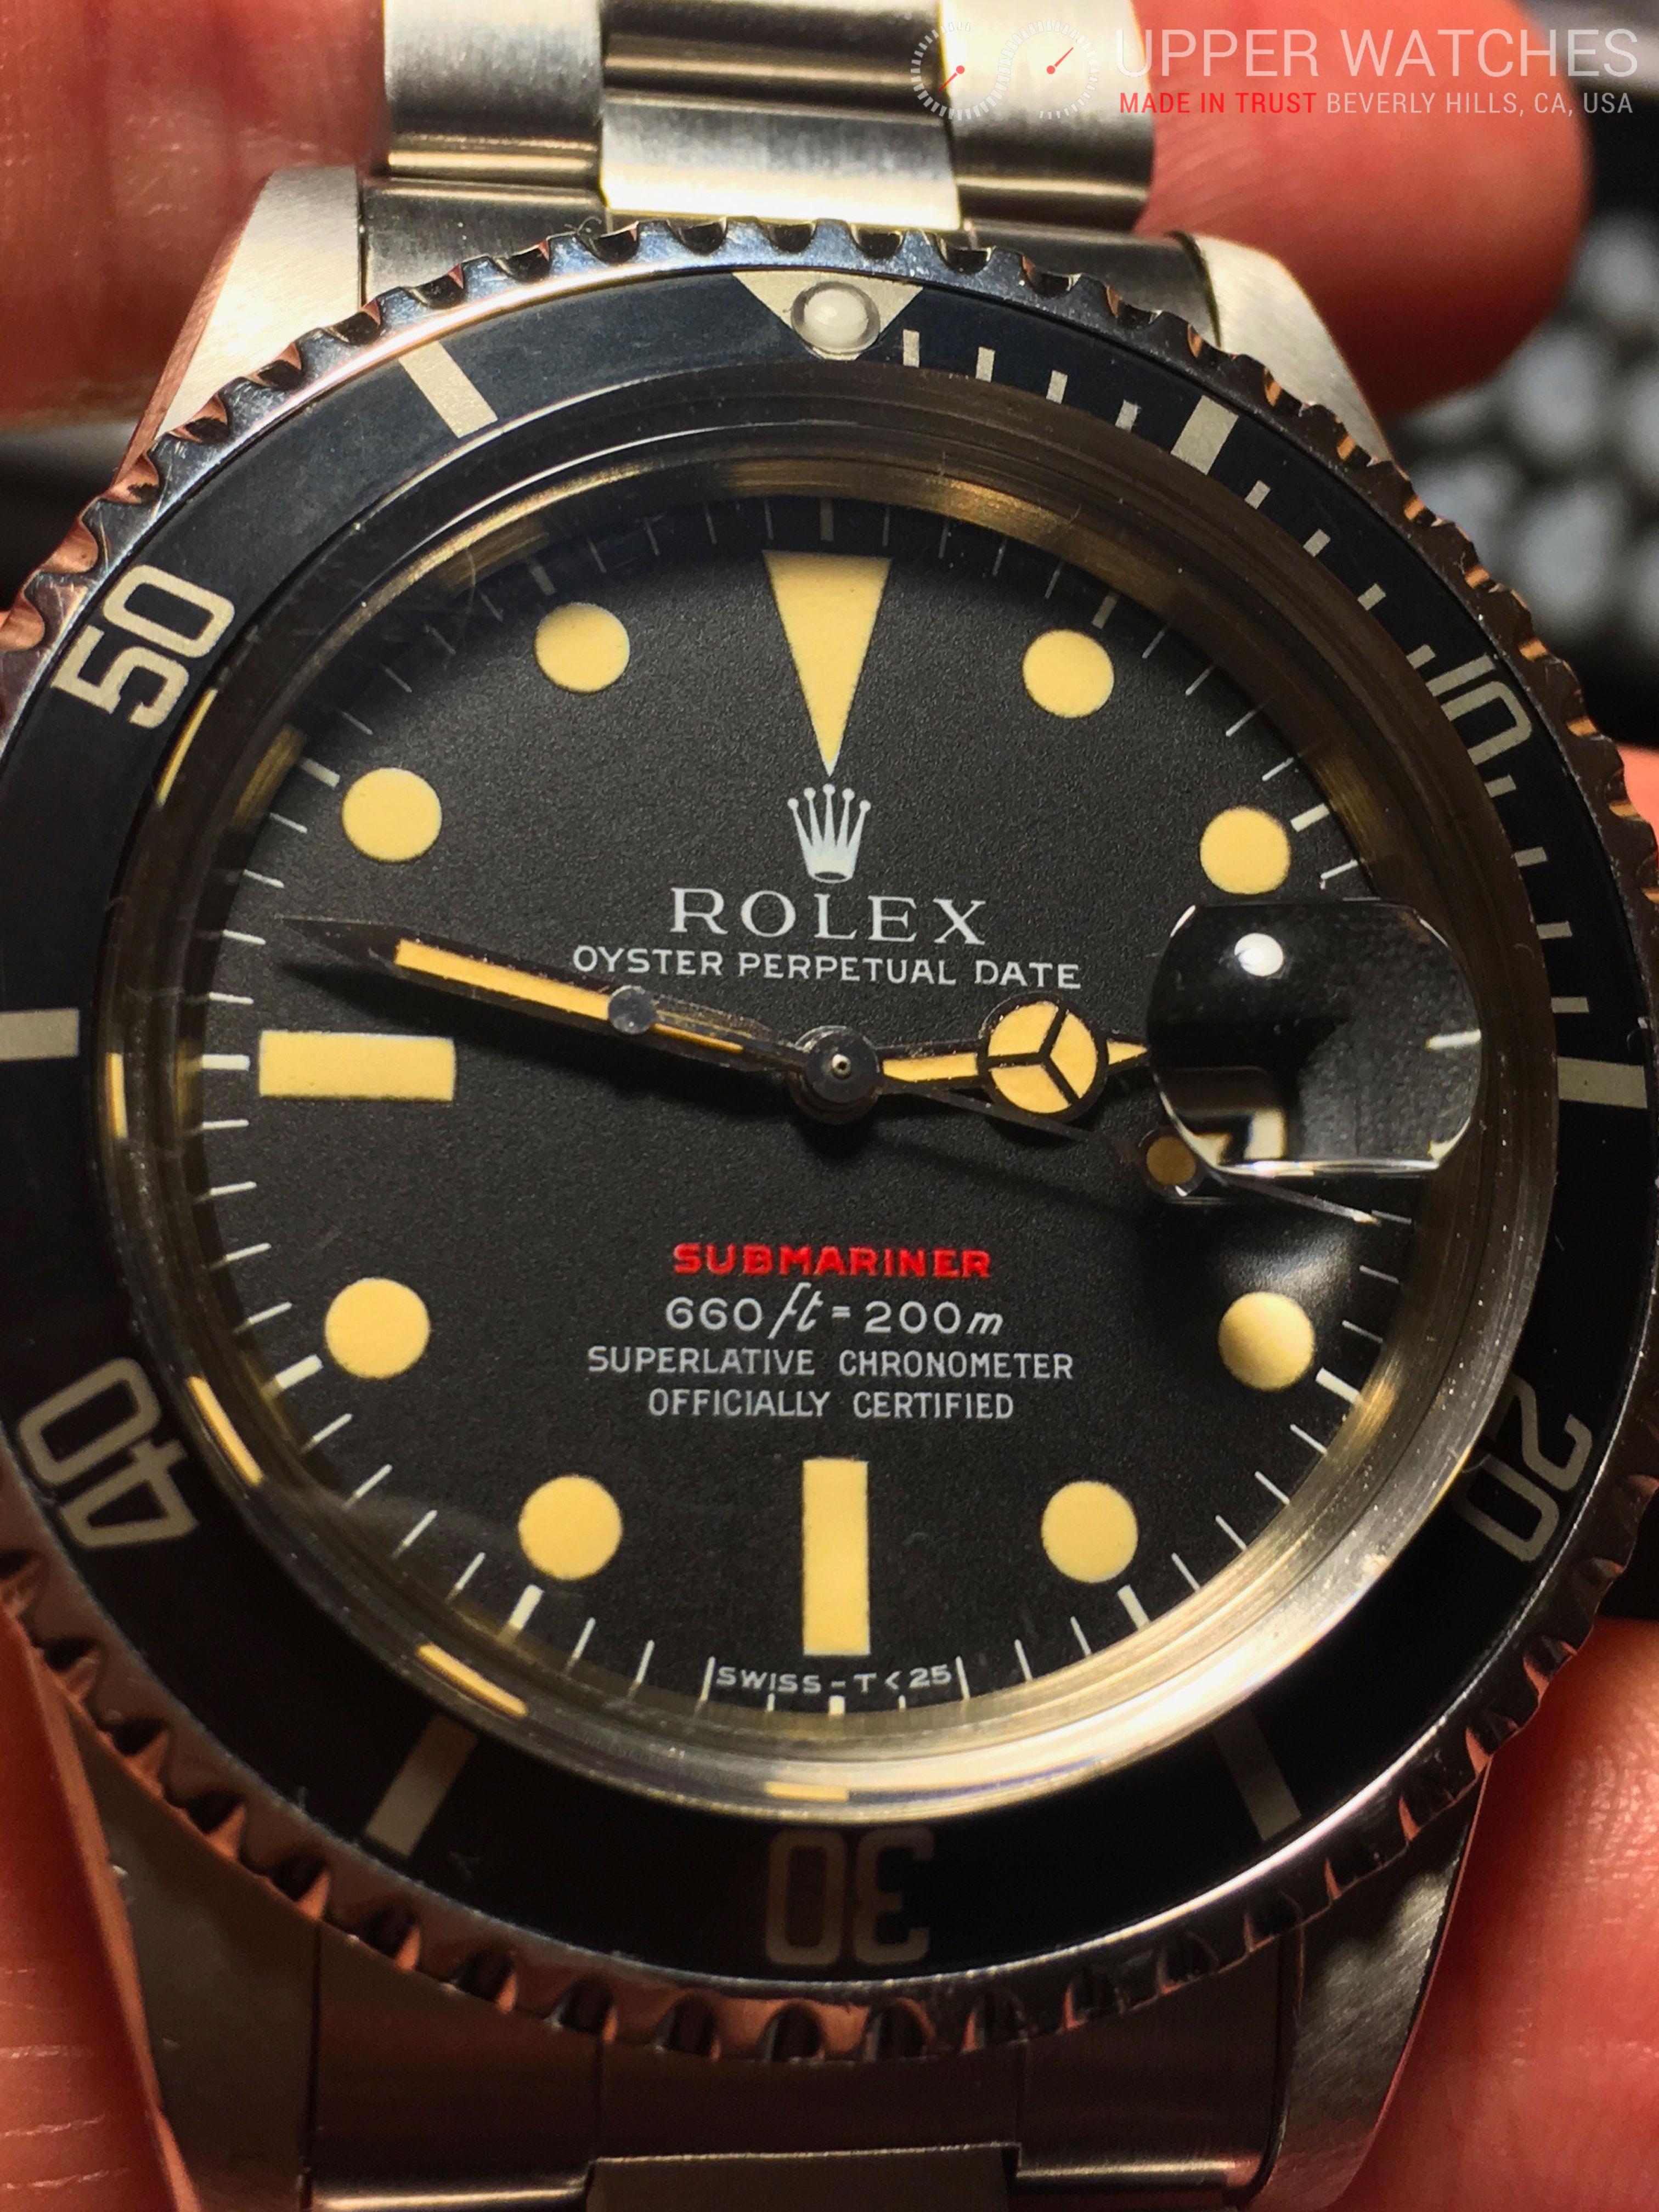 Used Rolex Submariner >> Rolex Red Submariner 1680 Circa 1972 - Upper Watches